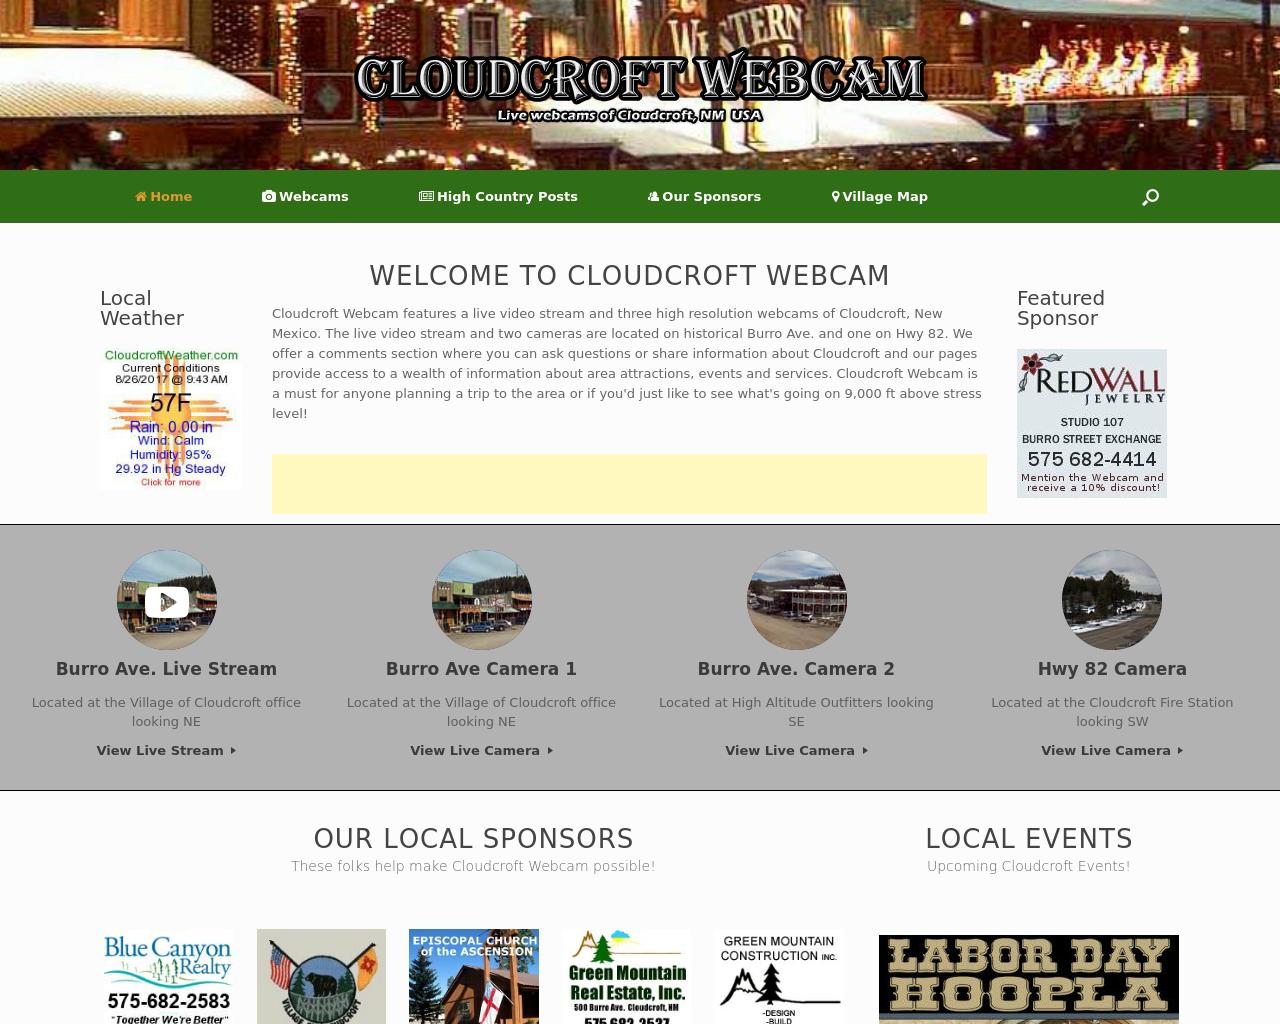 Cloudcroft-Webcam-Advertising-Reviews-Pricing